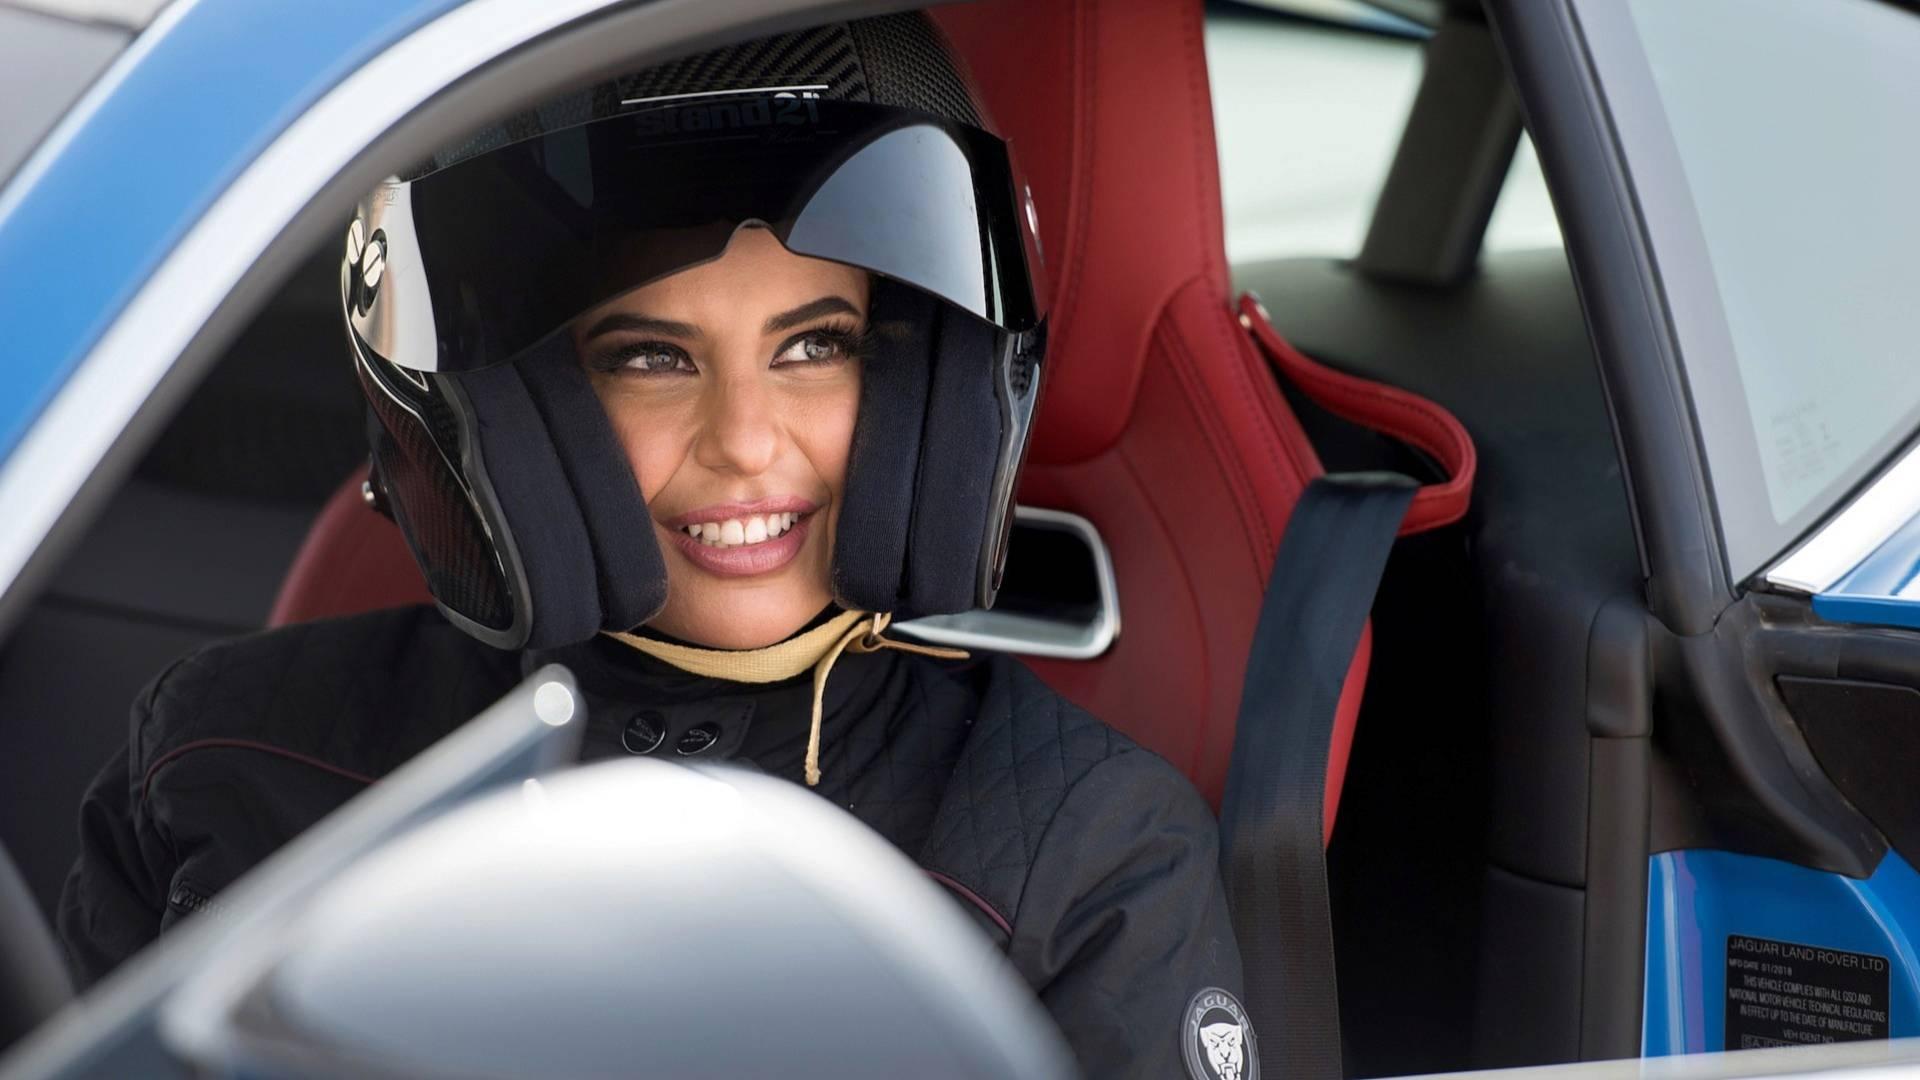 Photo of Από χτες οι γυναίκες στην Σαουδική Αραβία οδηγούν ελεύθερα [vid]